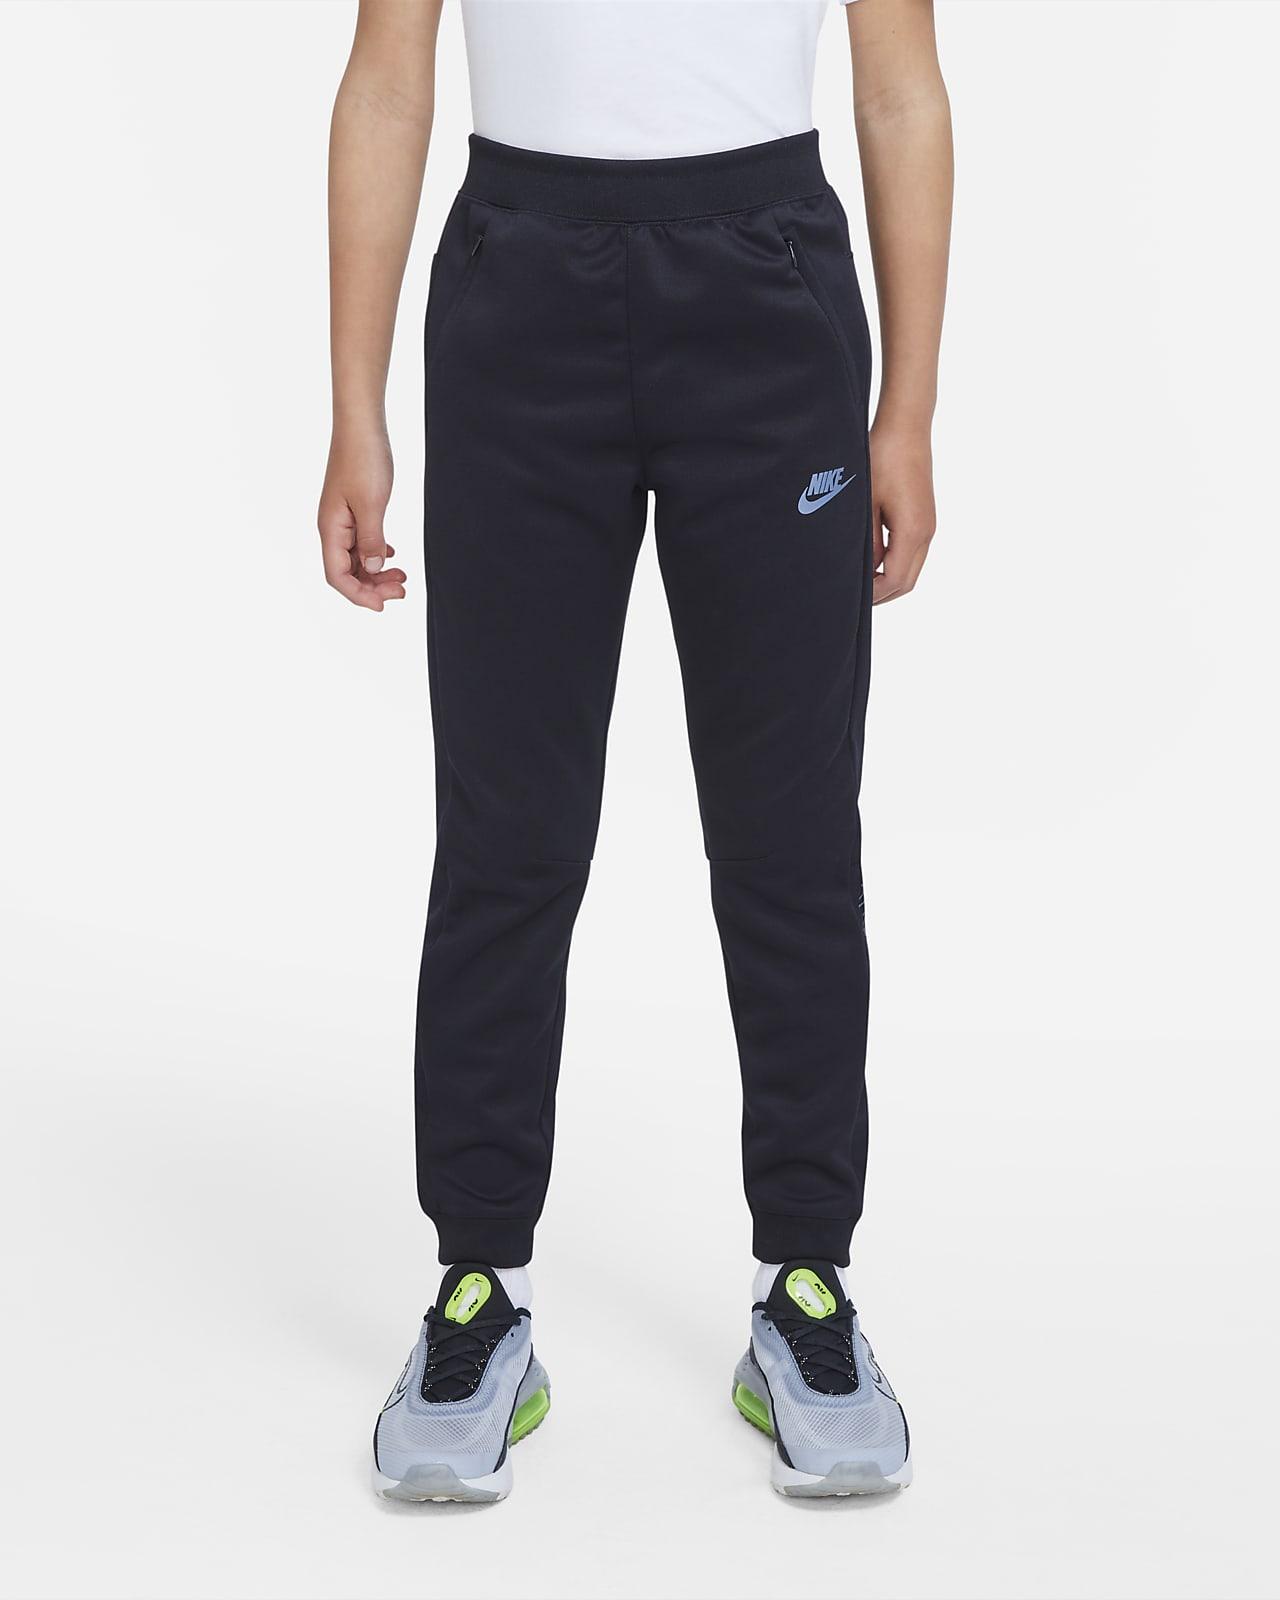 Pantaloni jogger Nike Air Max - Ragazzo